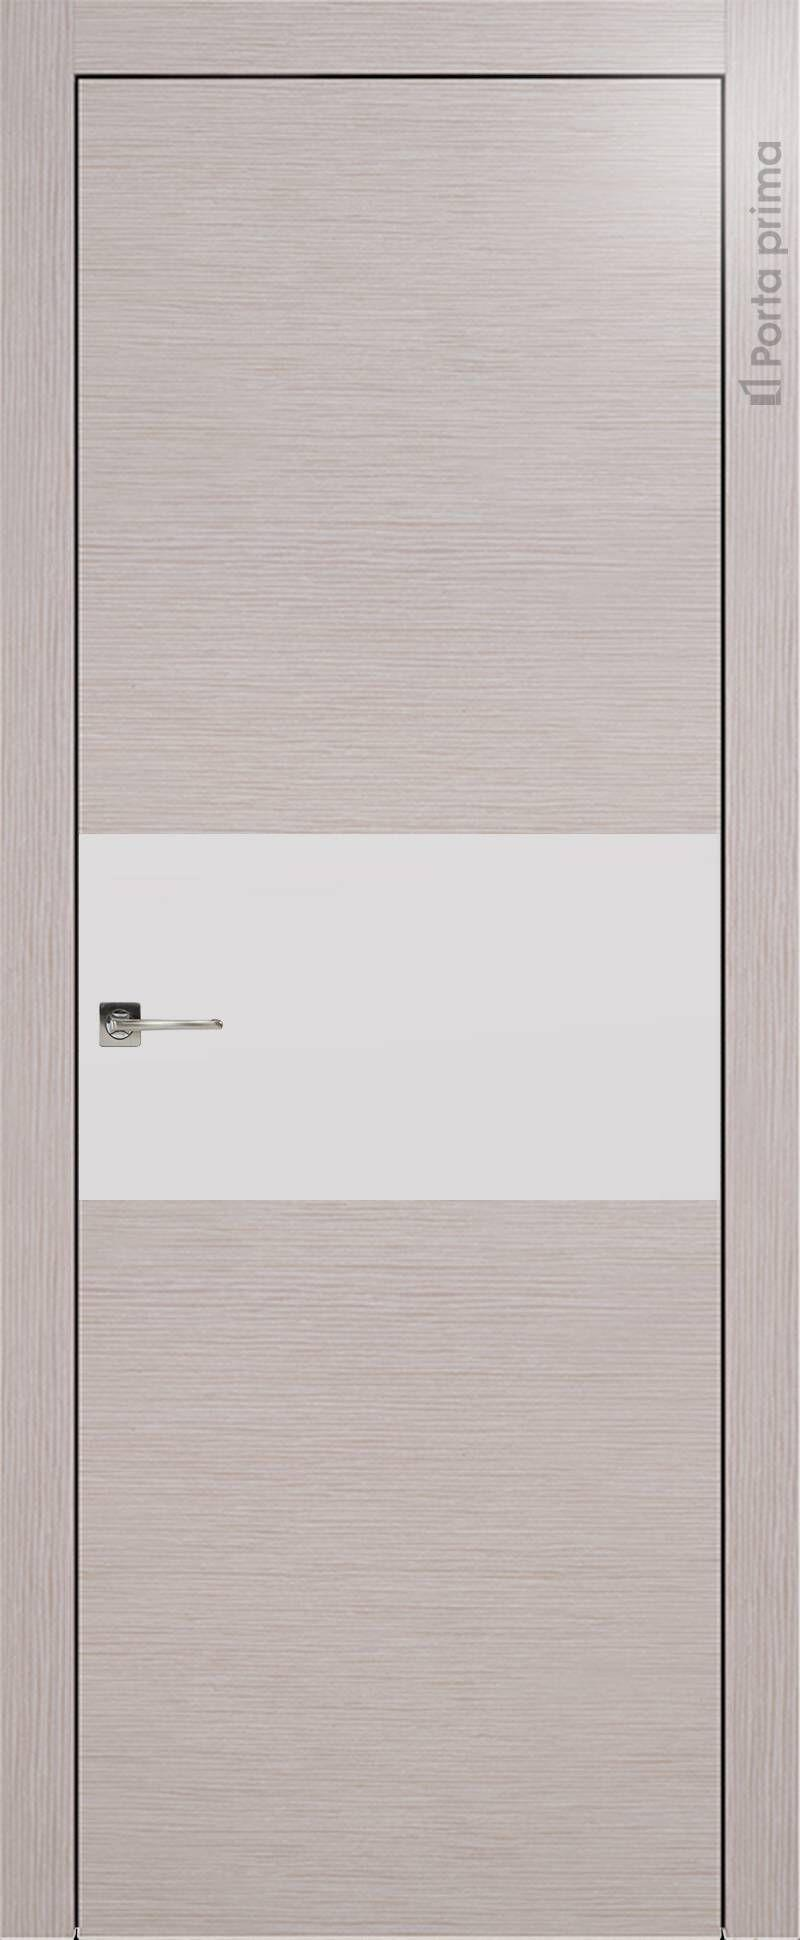 Tivoli Е-4 цвет - Дымчатый дуб Без стекла (ДГ)